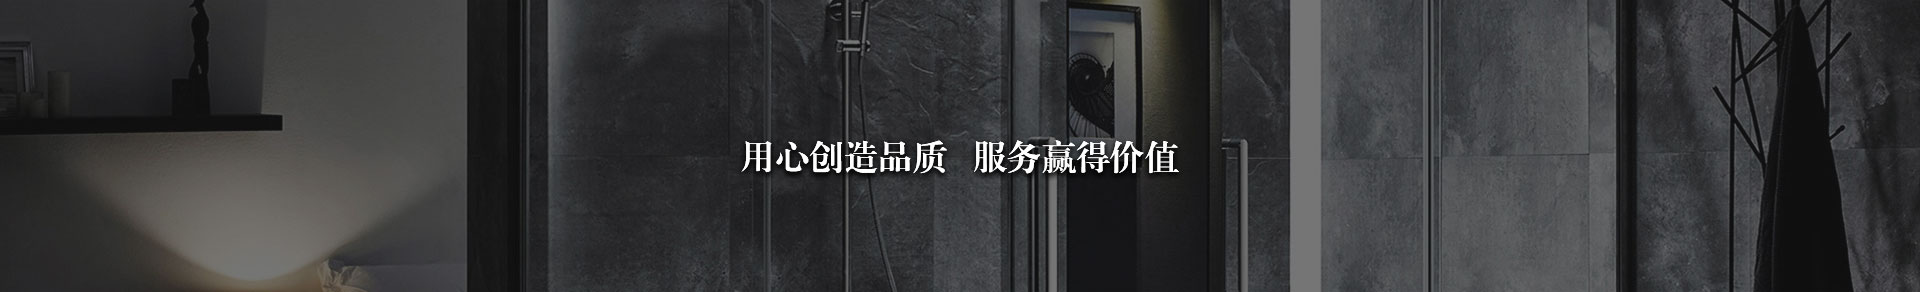 http://www.zjqiyuan.cn/data/upload/201908/20190816123450_929.jpg